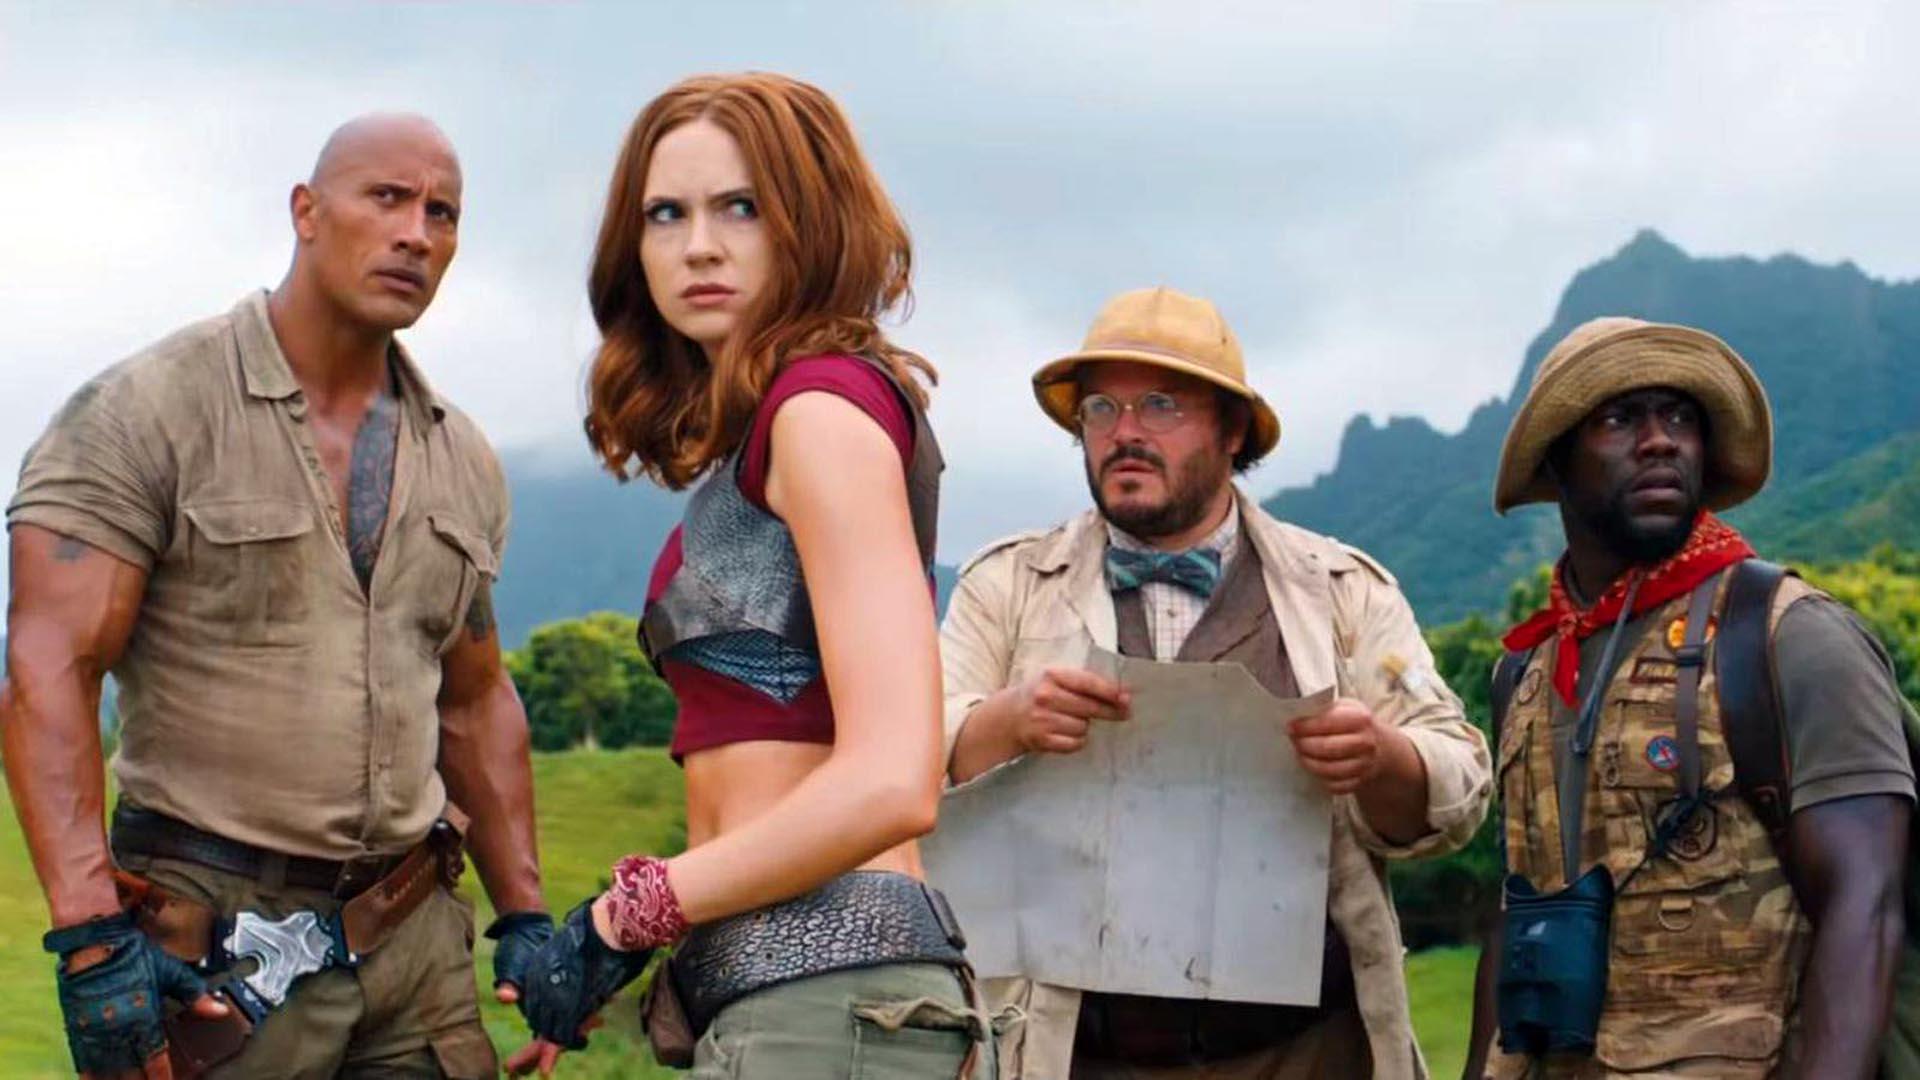 Jumanji : Welcome To The Jungle Akan Menjadi Film 'Action